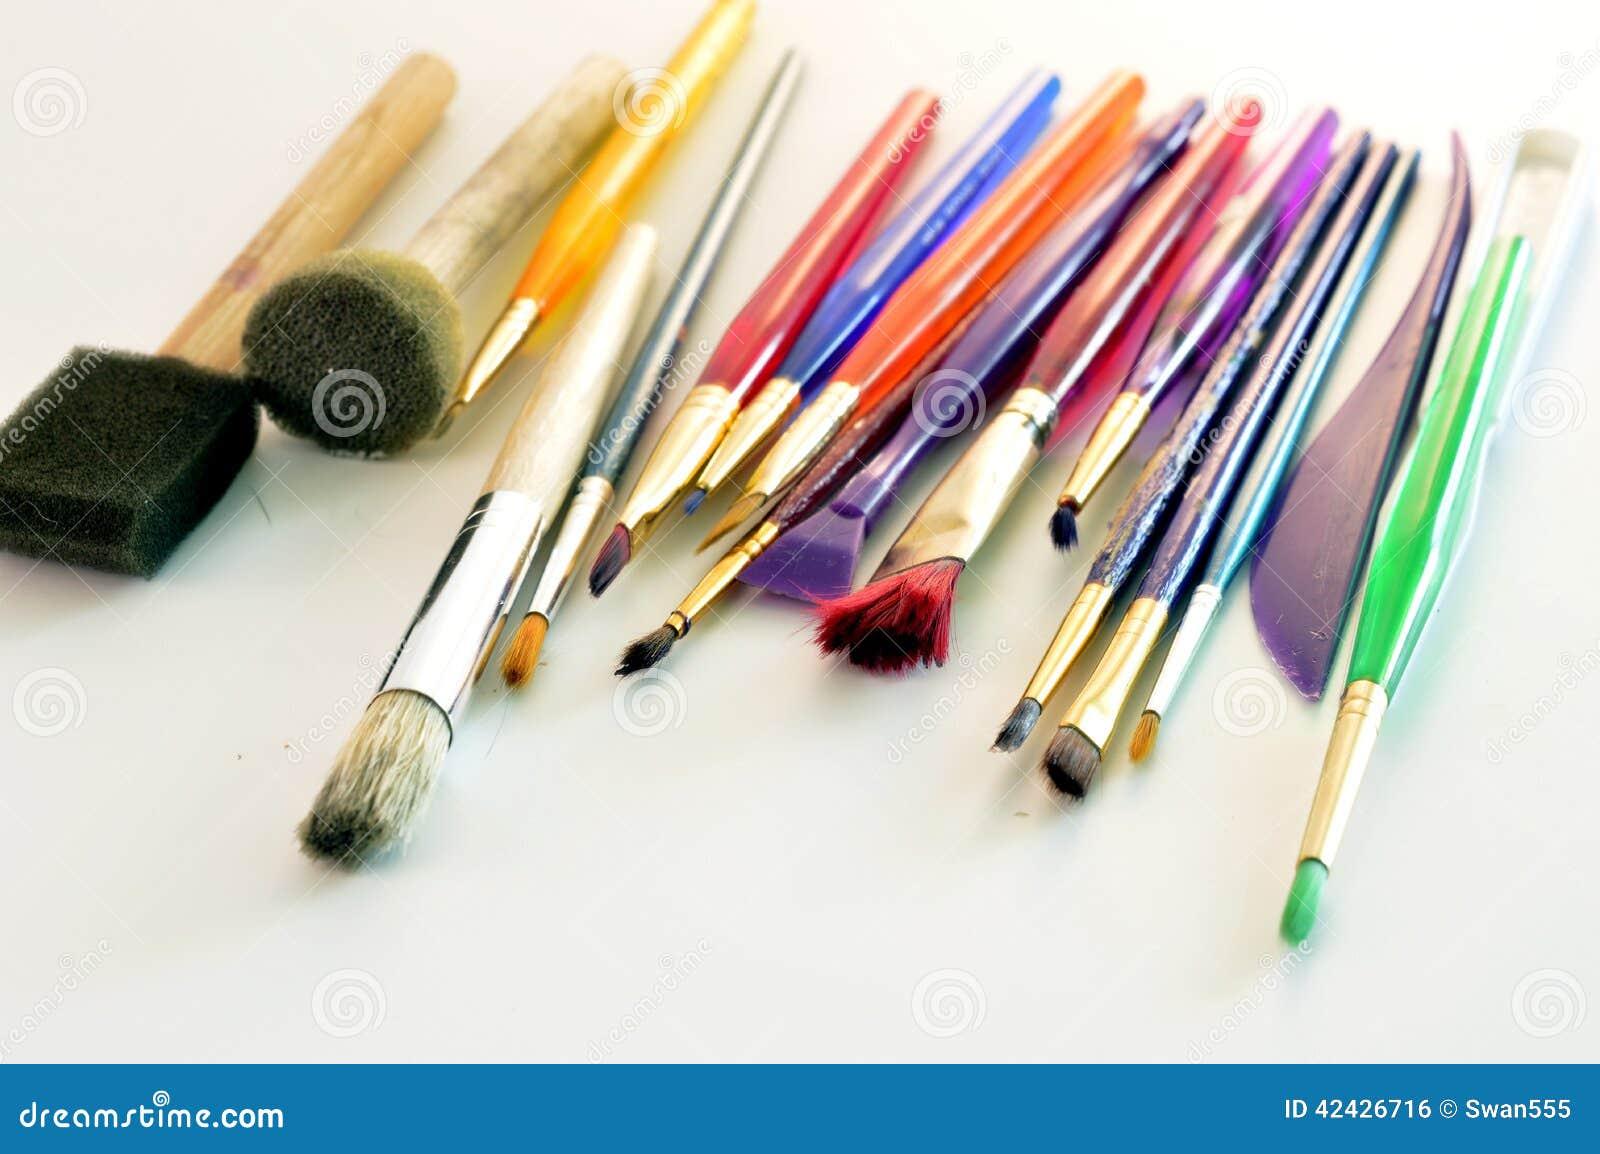 Cepillos usados para dibujar